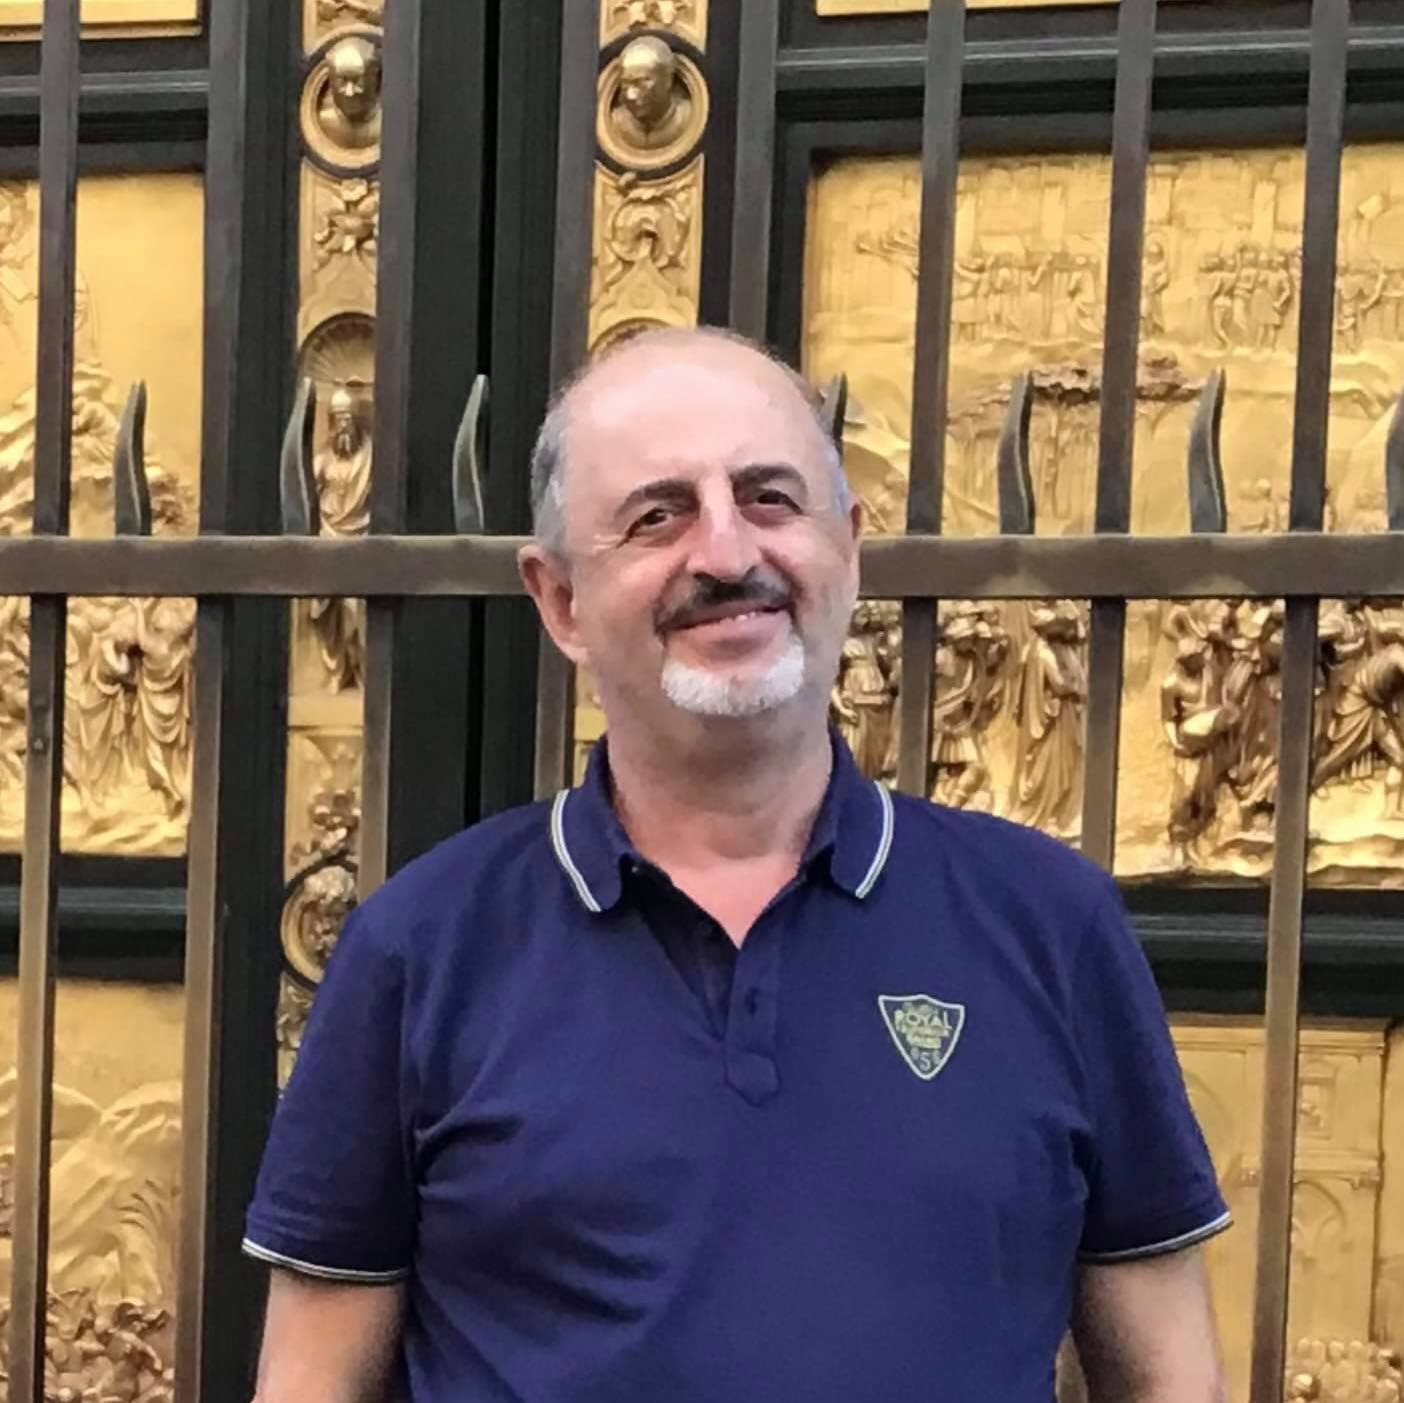 Refleksion mbi deklaratën e ambasadores amerikane- Nga Ardian Radovicka